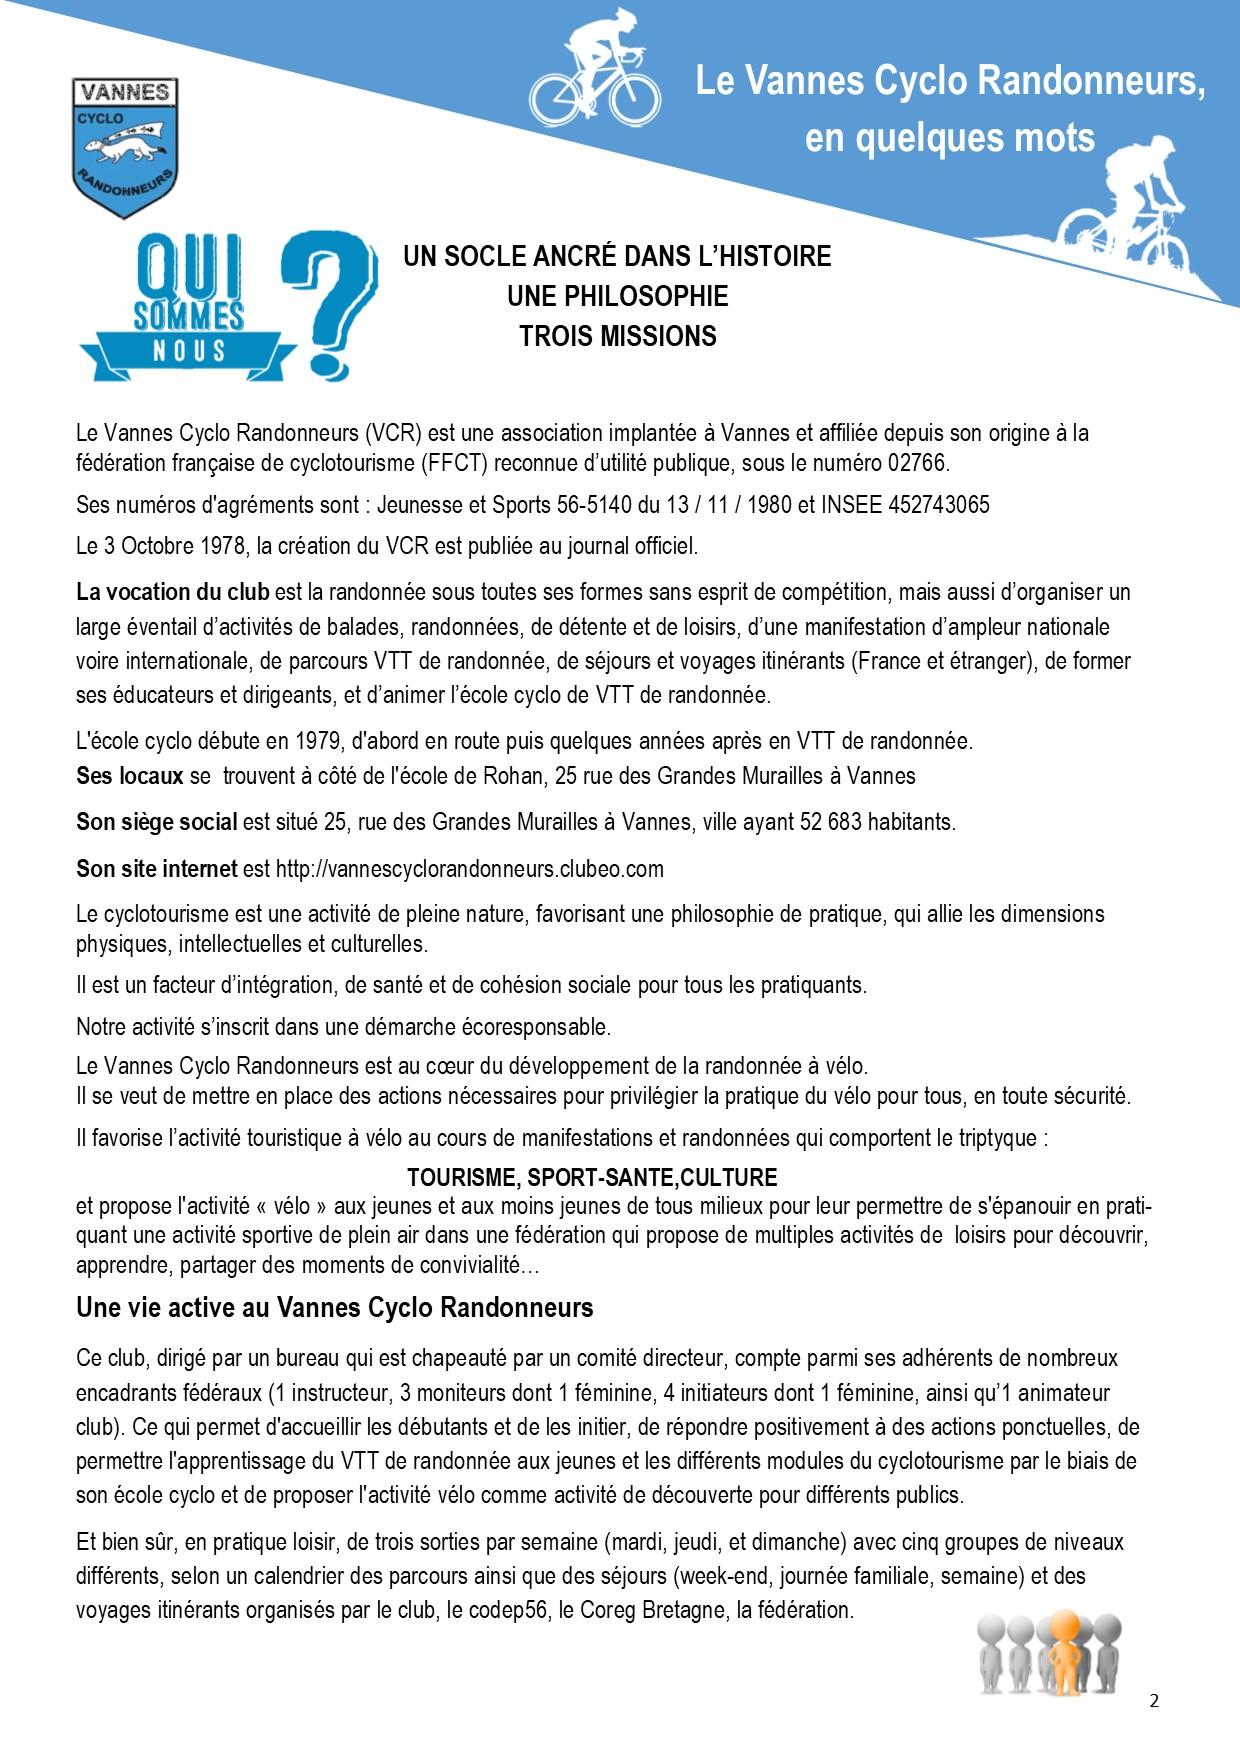 DOSSIER DE PARTENARIAT PENTECOTE AUTOUR DU GOLFE MORBIHAN 2020 3.jpg